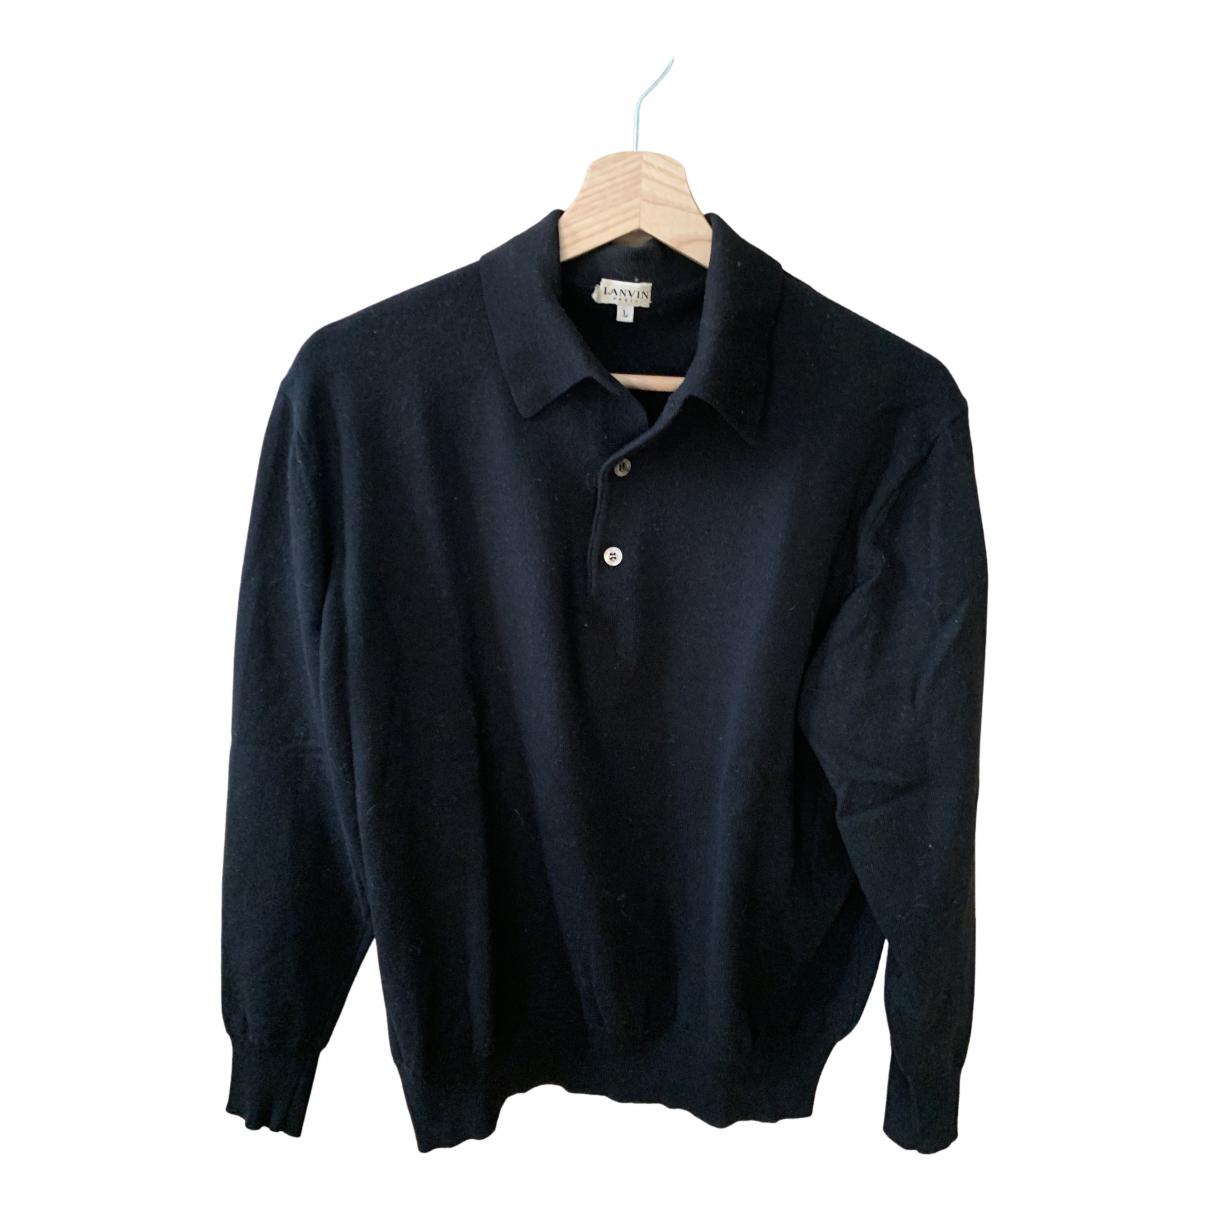 Lanvin N Black Cashmere Knitwear & Sweatshirts for Men L International